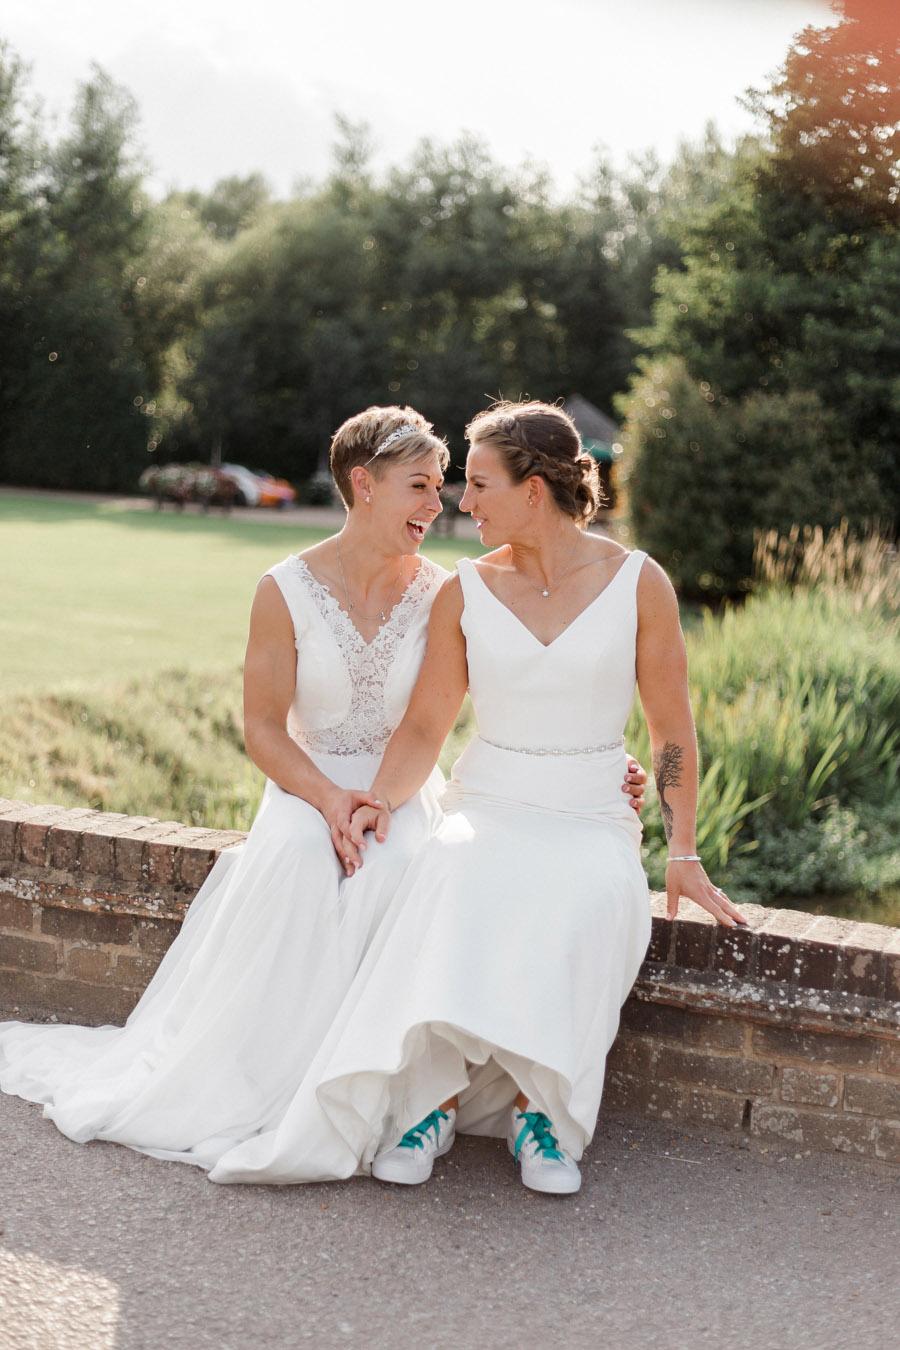 Tewin Bury farm wedding blog, photo credit Absolute Photo UK (33)